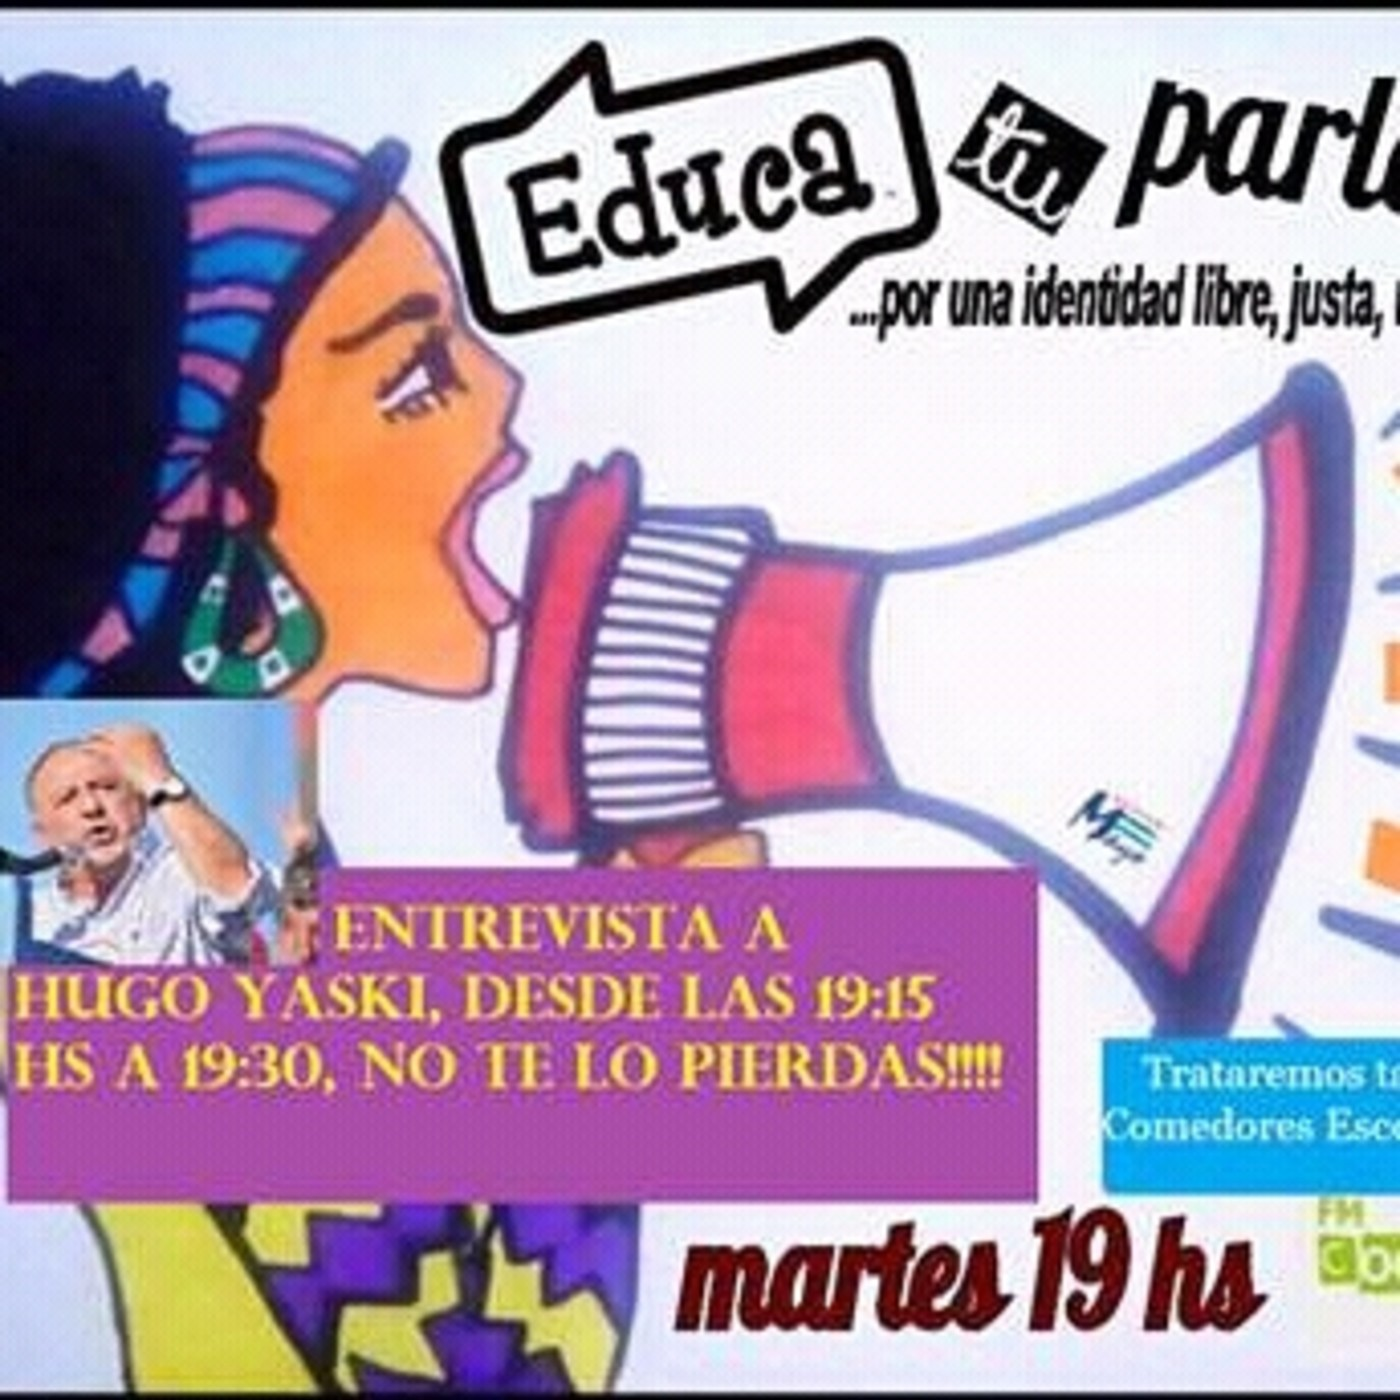 Educa tu parlante editorial comedores escolares lula for Comedores escolares en colombia